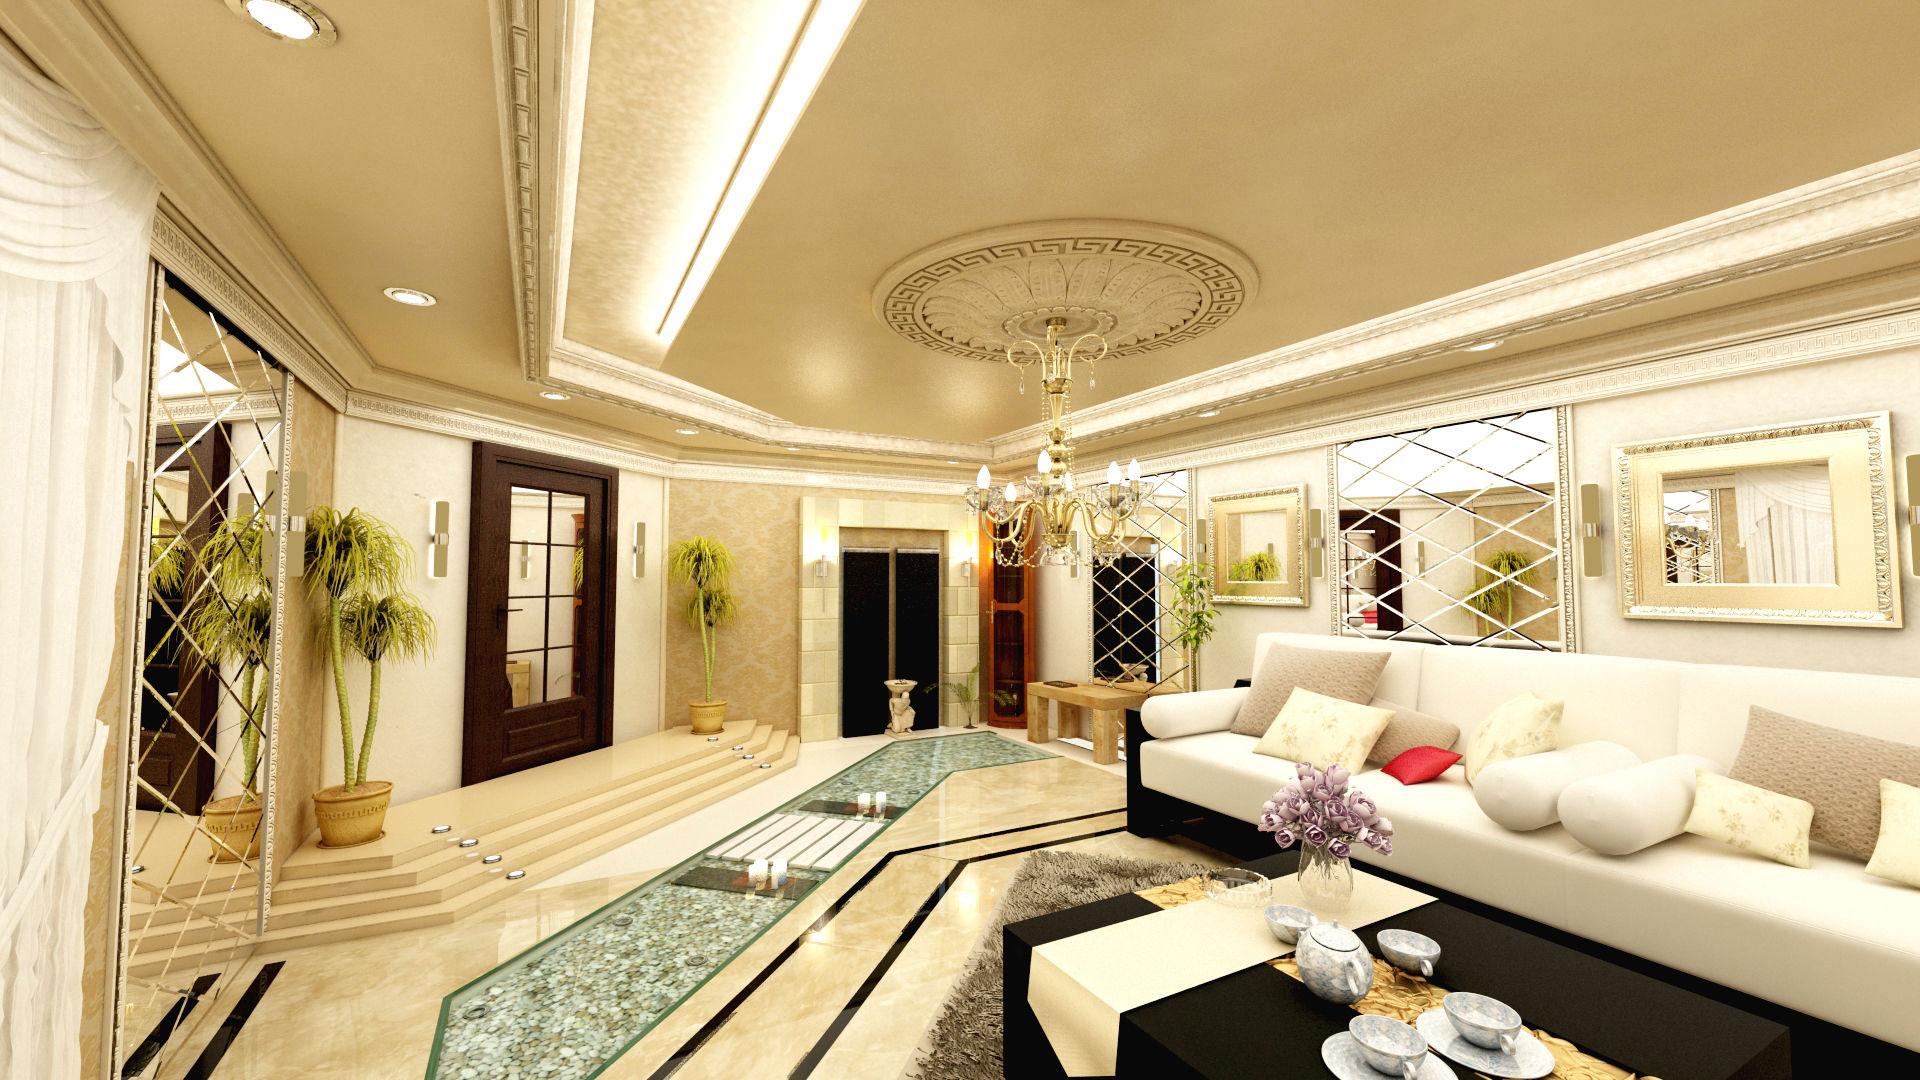 arabic style living room ideas decorating modern interior design decor and photos guiding principles1